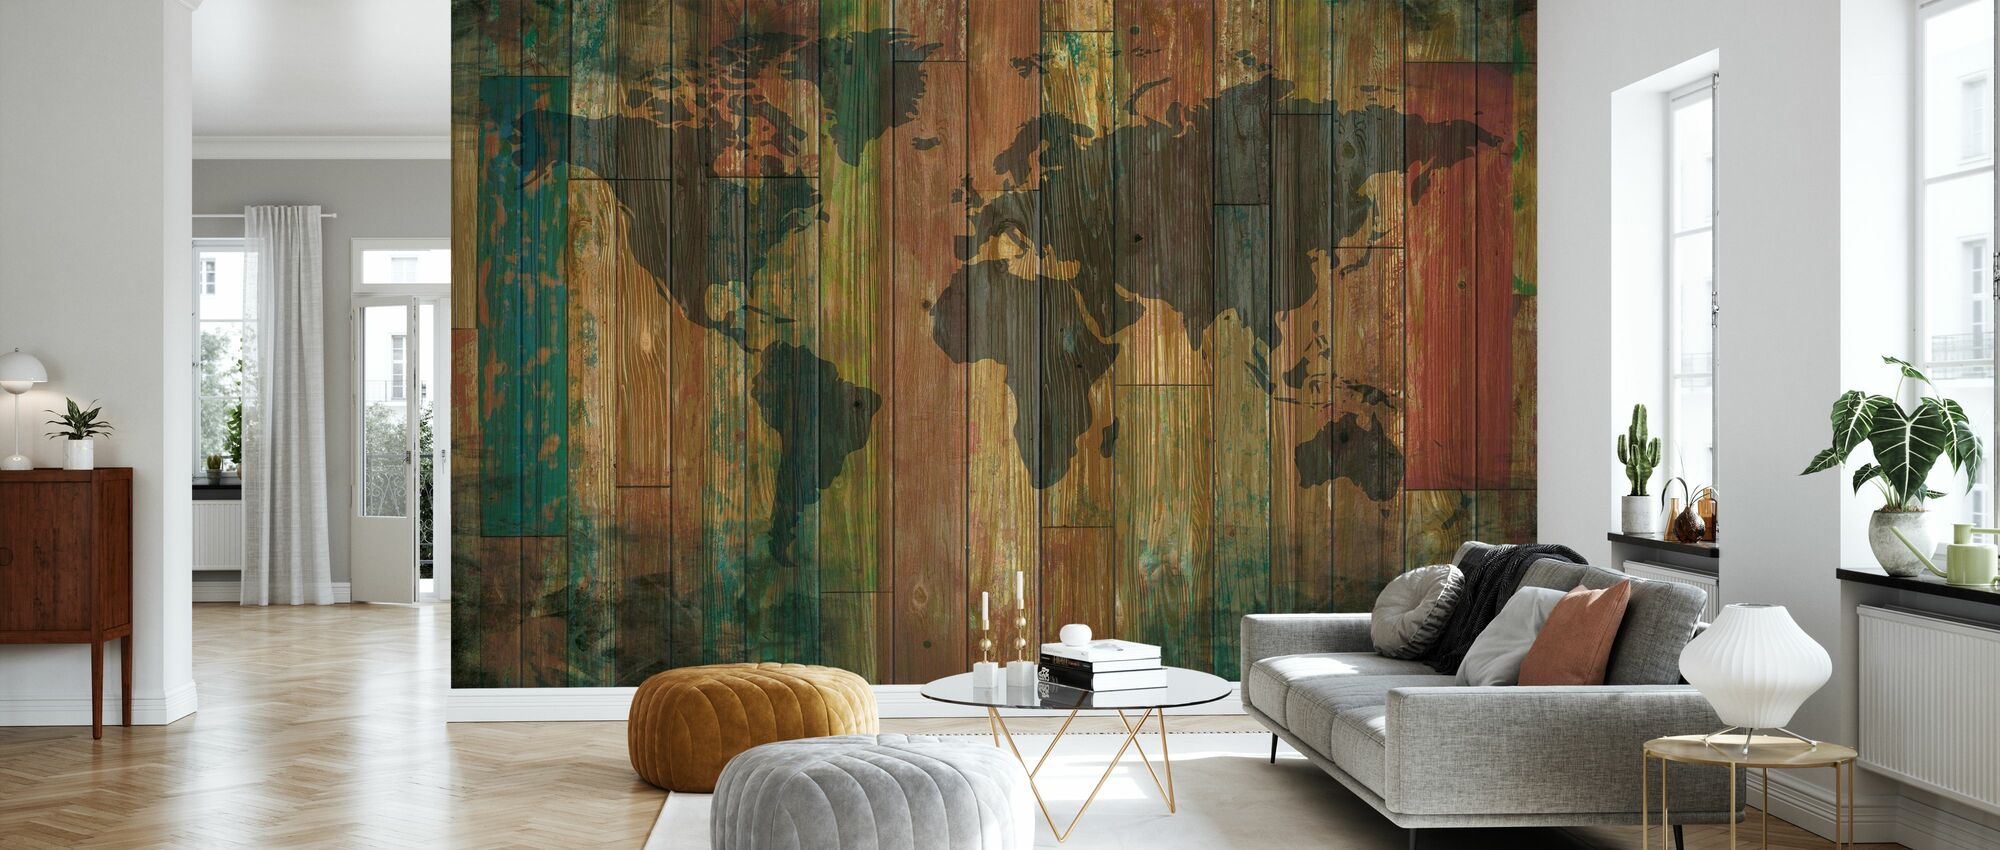 Plank Wall Map - Tapete - Wohnzimmer